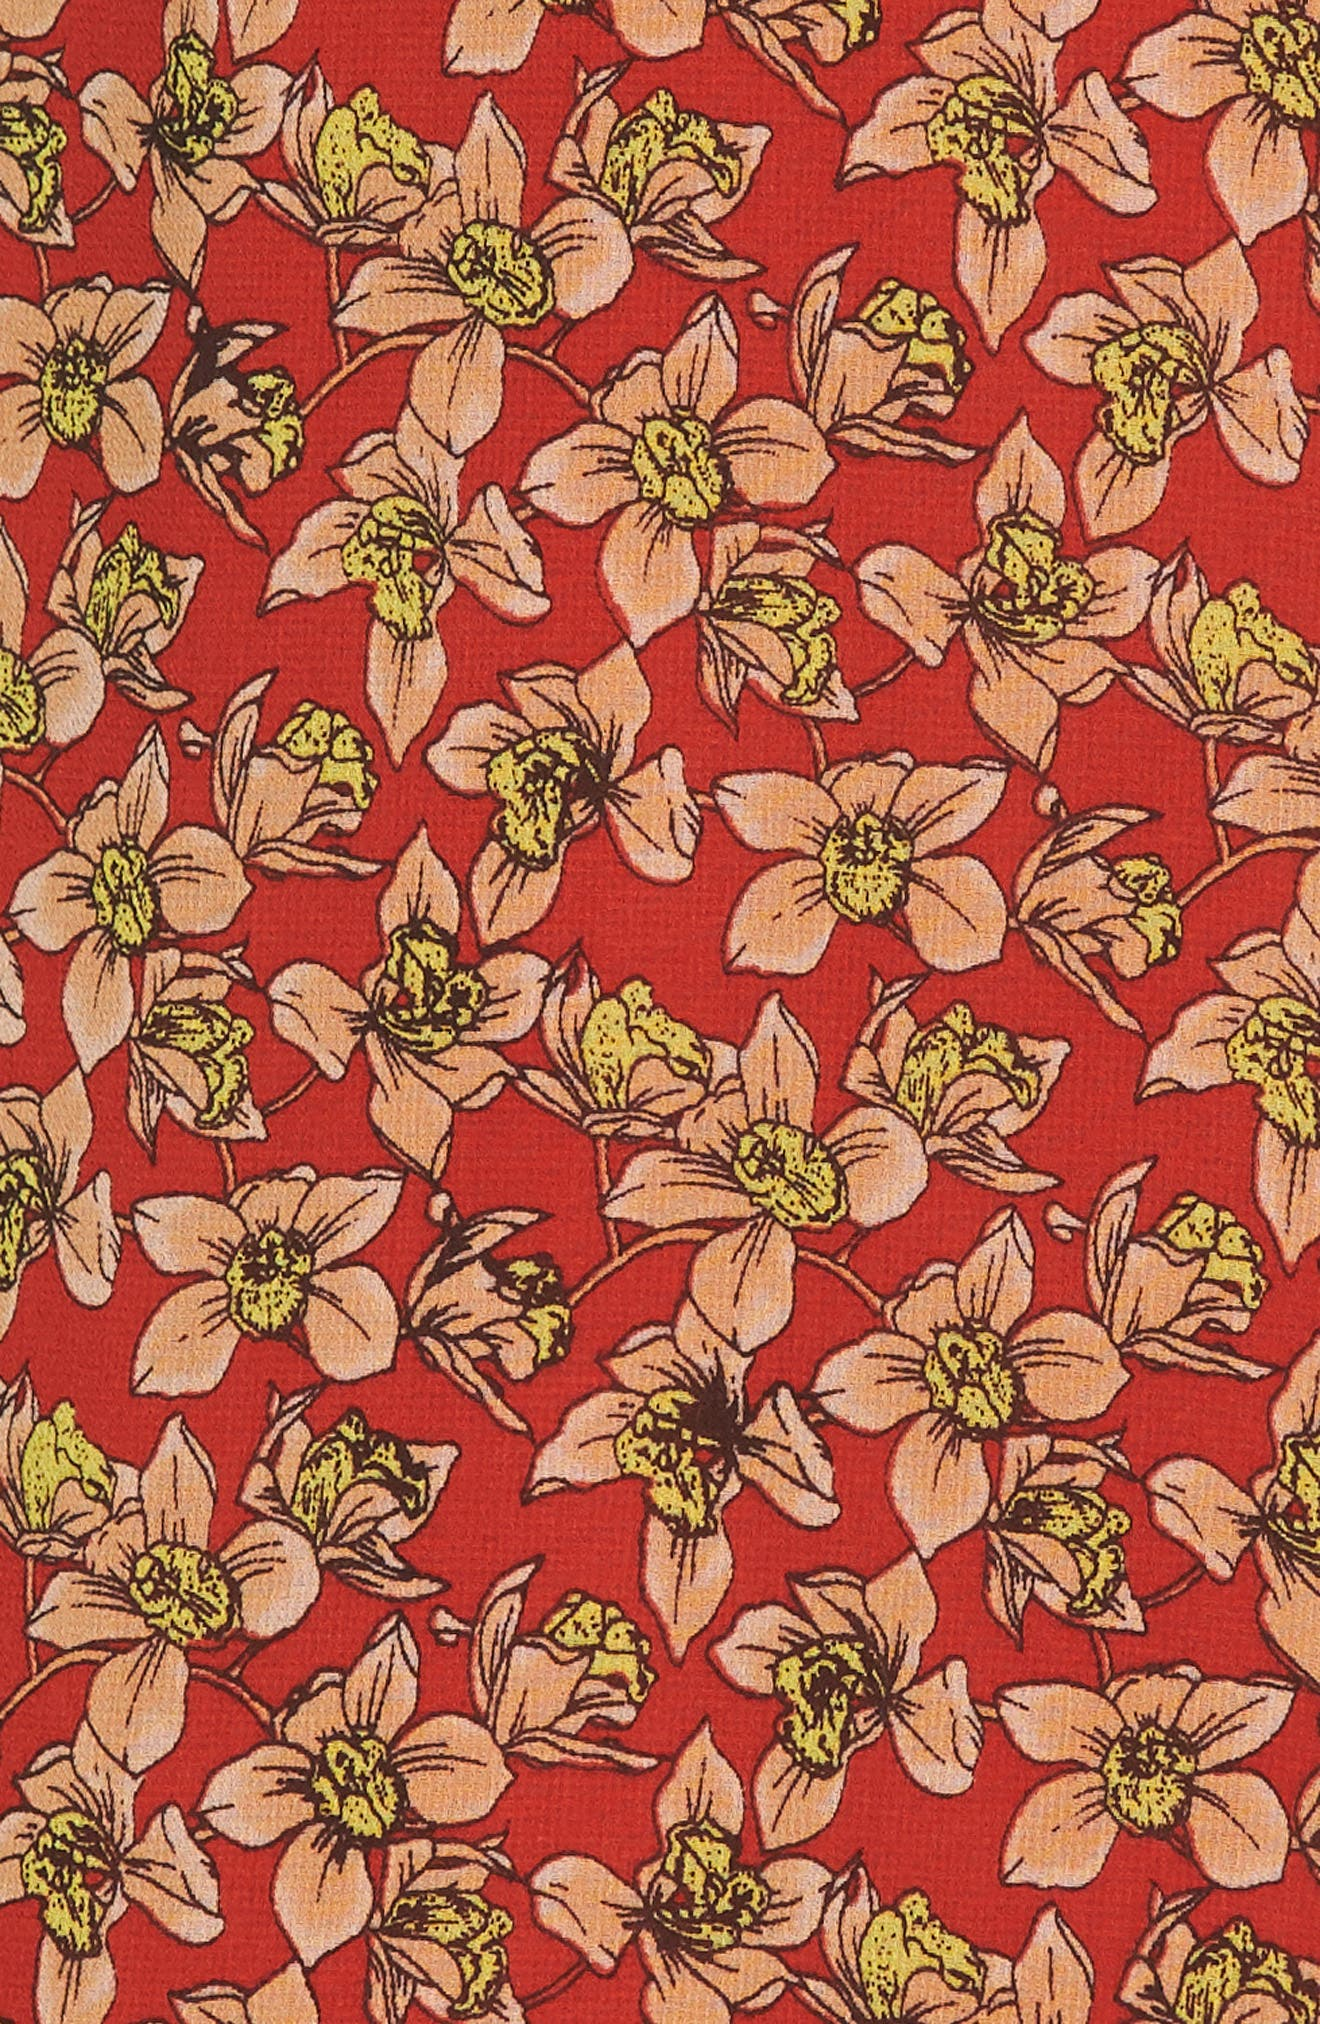 Ana Floral Wrap Dress,                             Alternate thumbnail 5, color,                             603